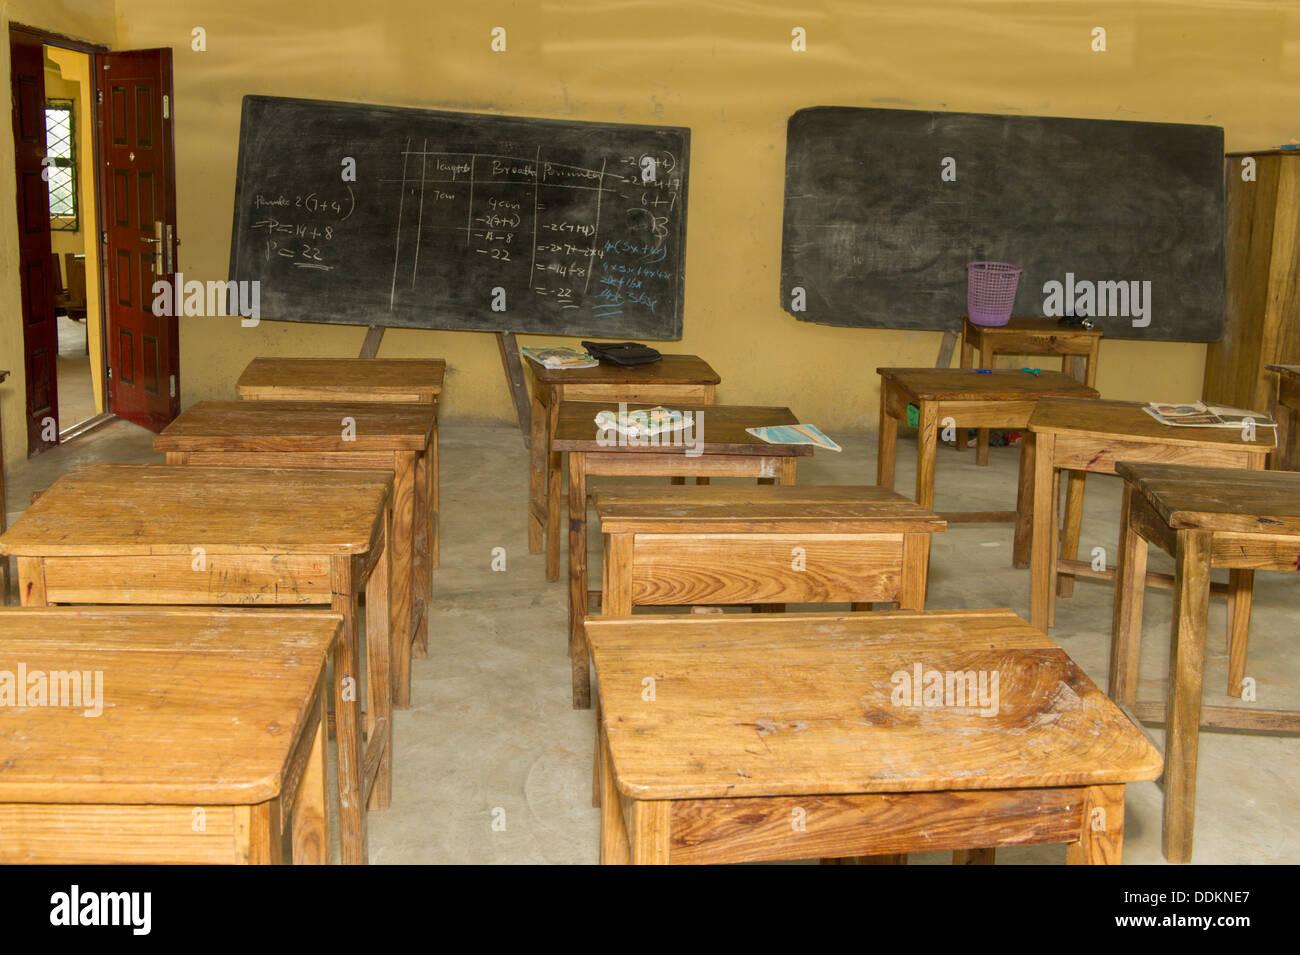 Nigeria Classroom Stock Photos  Nigeria Classroom Stock